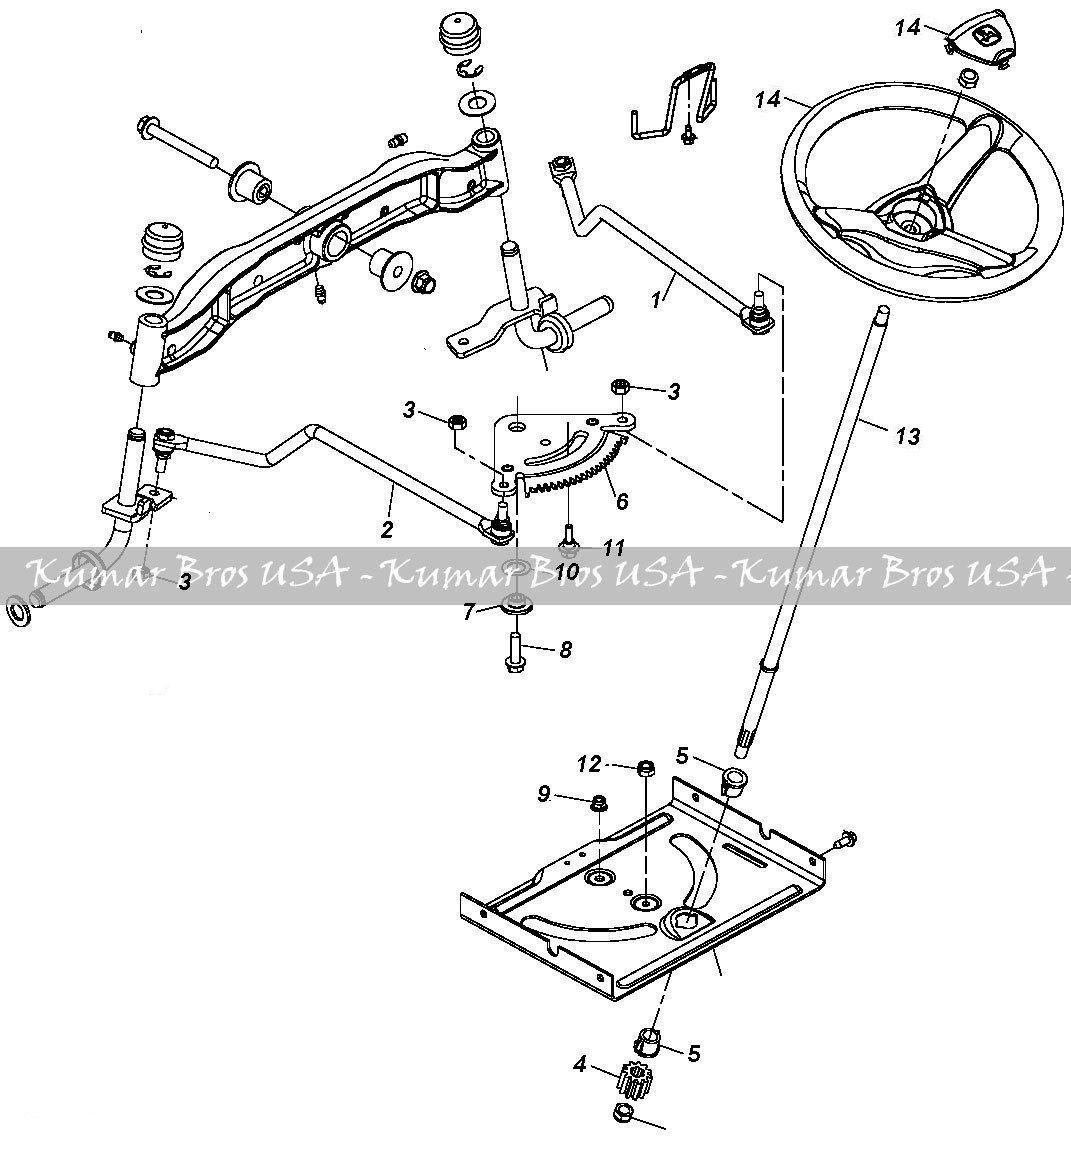 New Kumar Bros Usa Steering Kit Shaft Amp Wheel Fits John